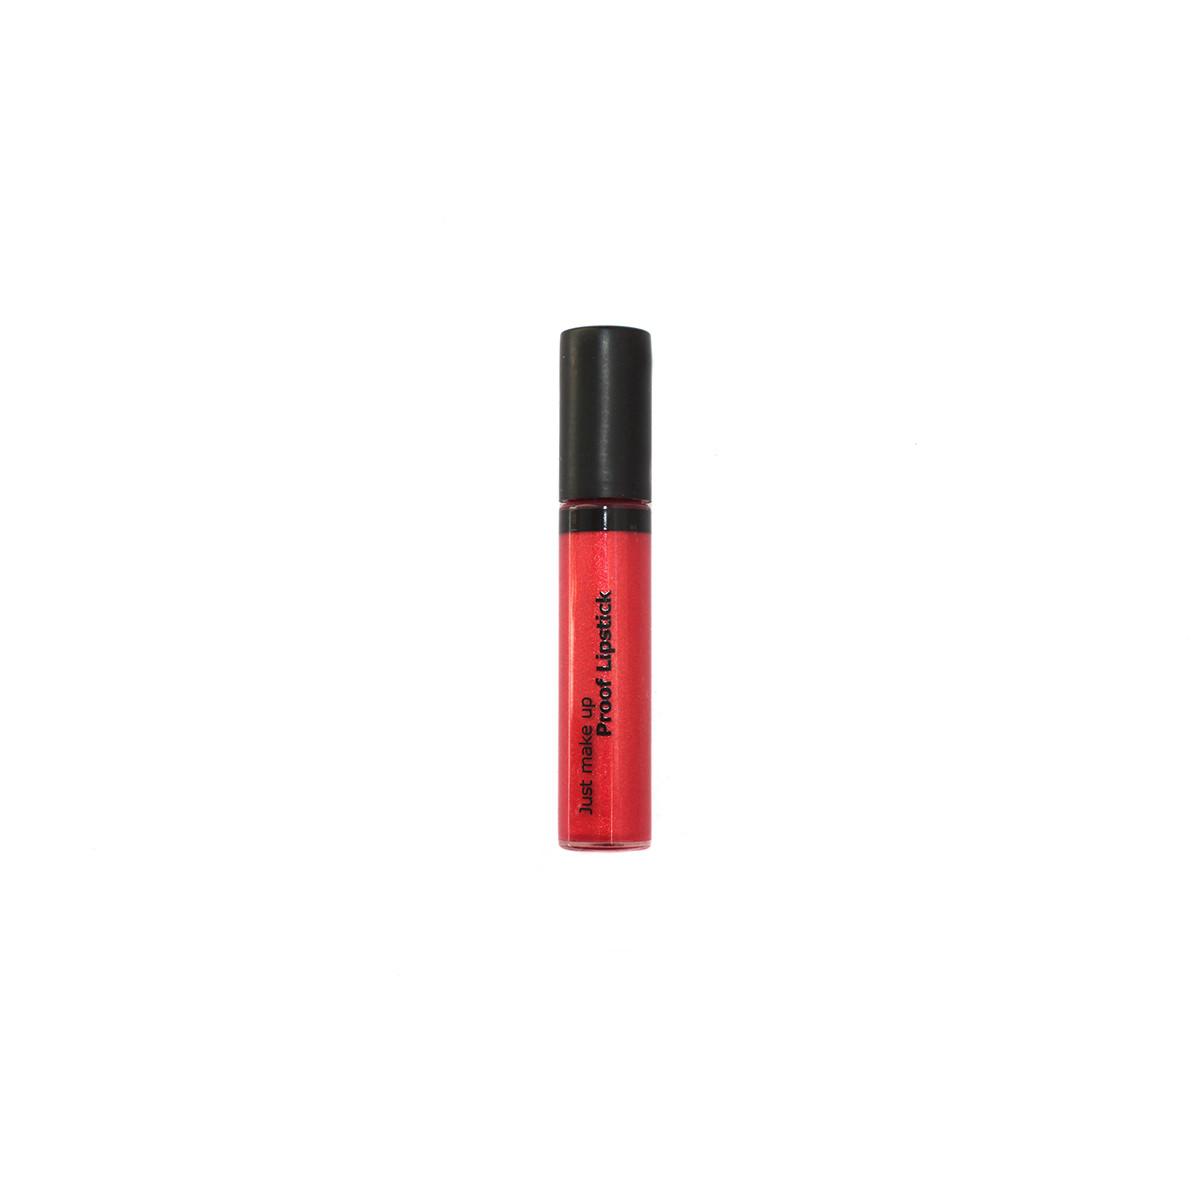 JUST  Proof Lipstick - shine  Устойчивая жидкая помада  т.23, фото 1